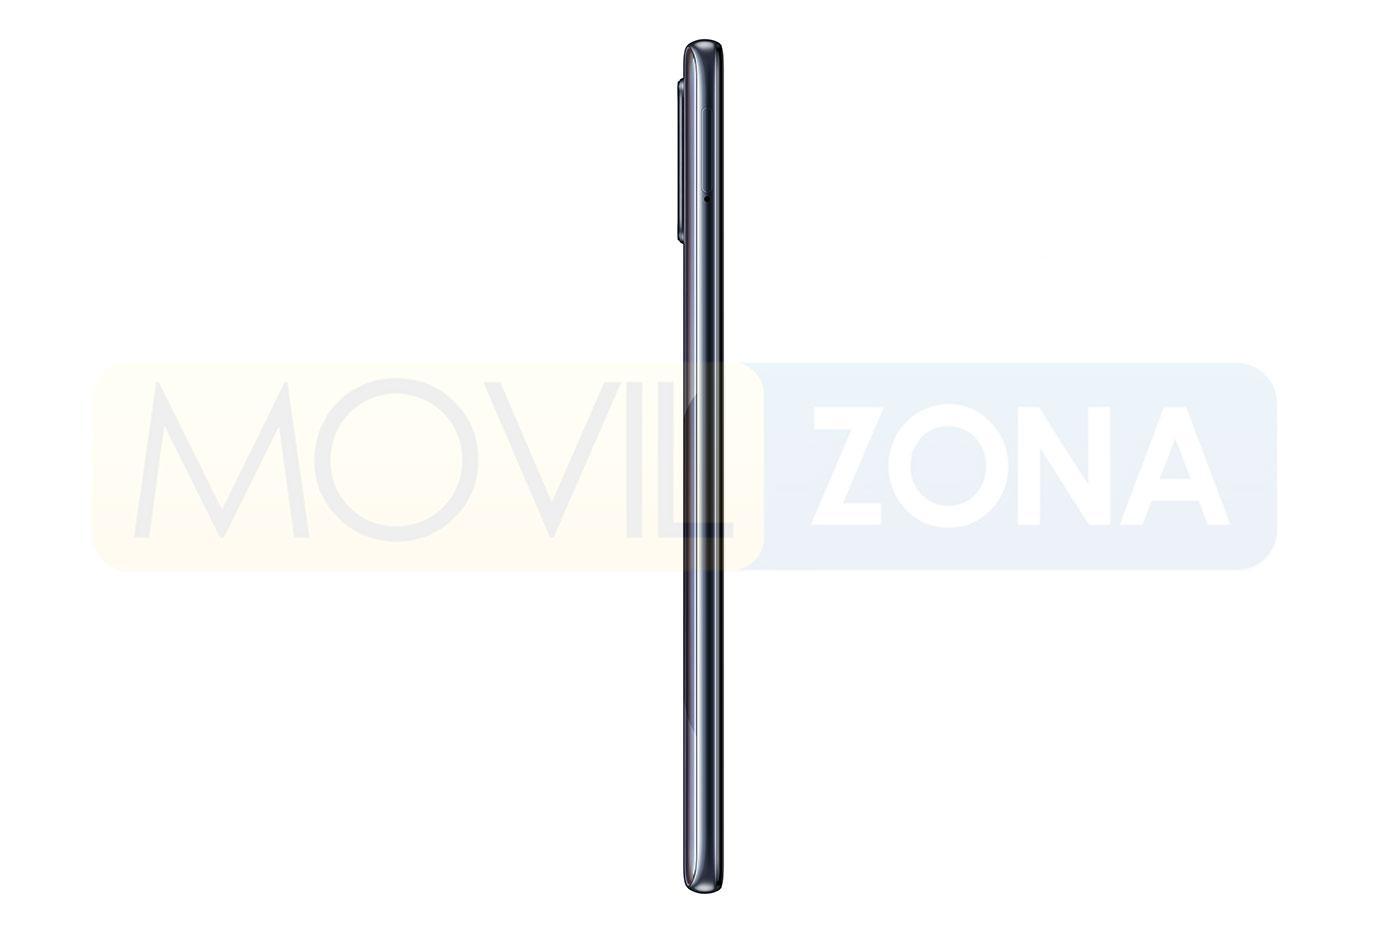 Samsung Galaxy A71 lateral